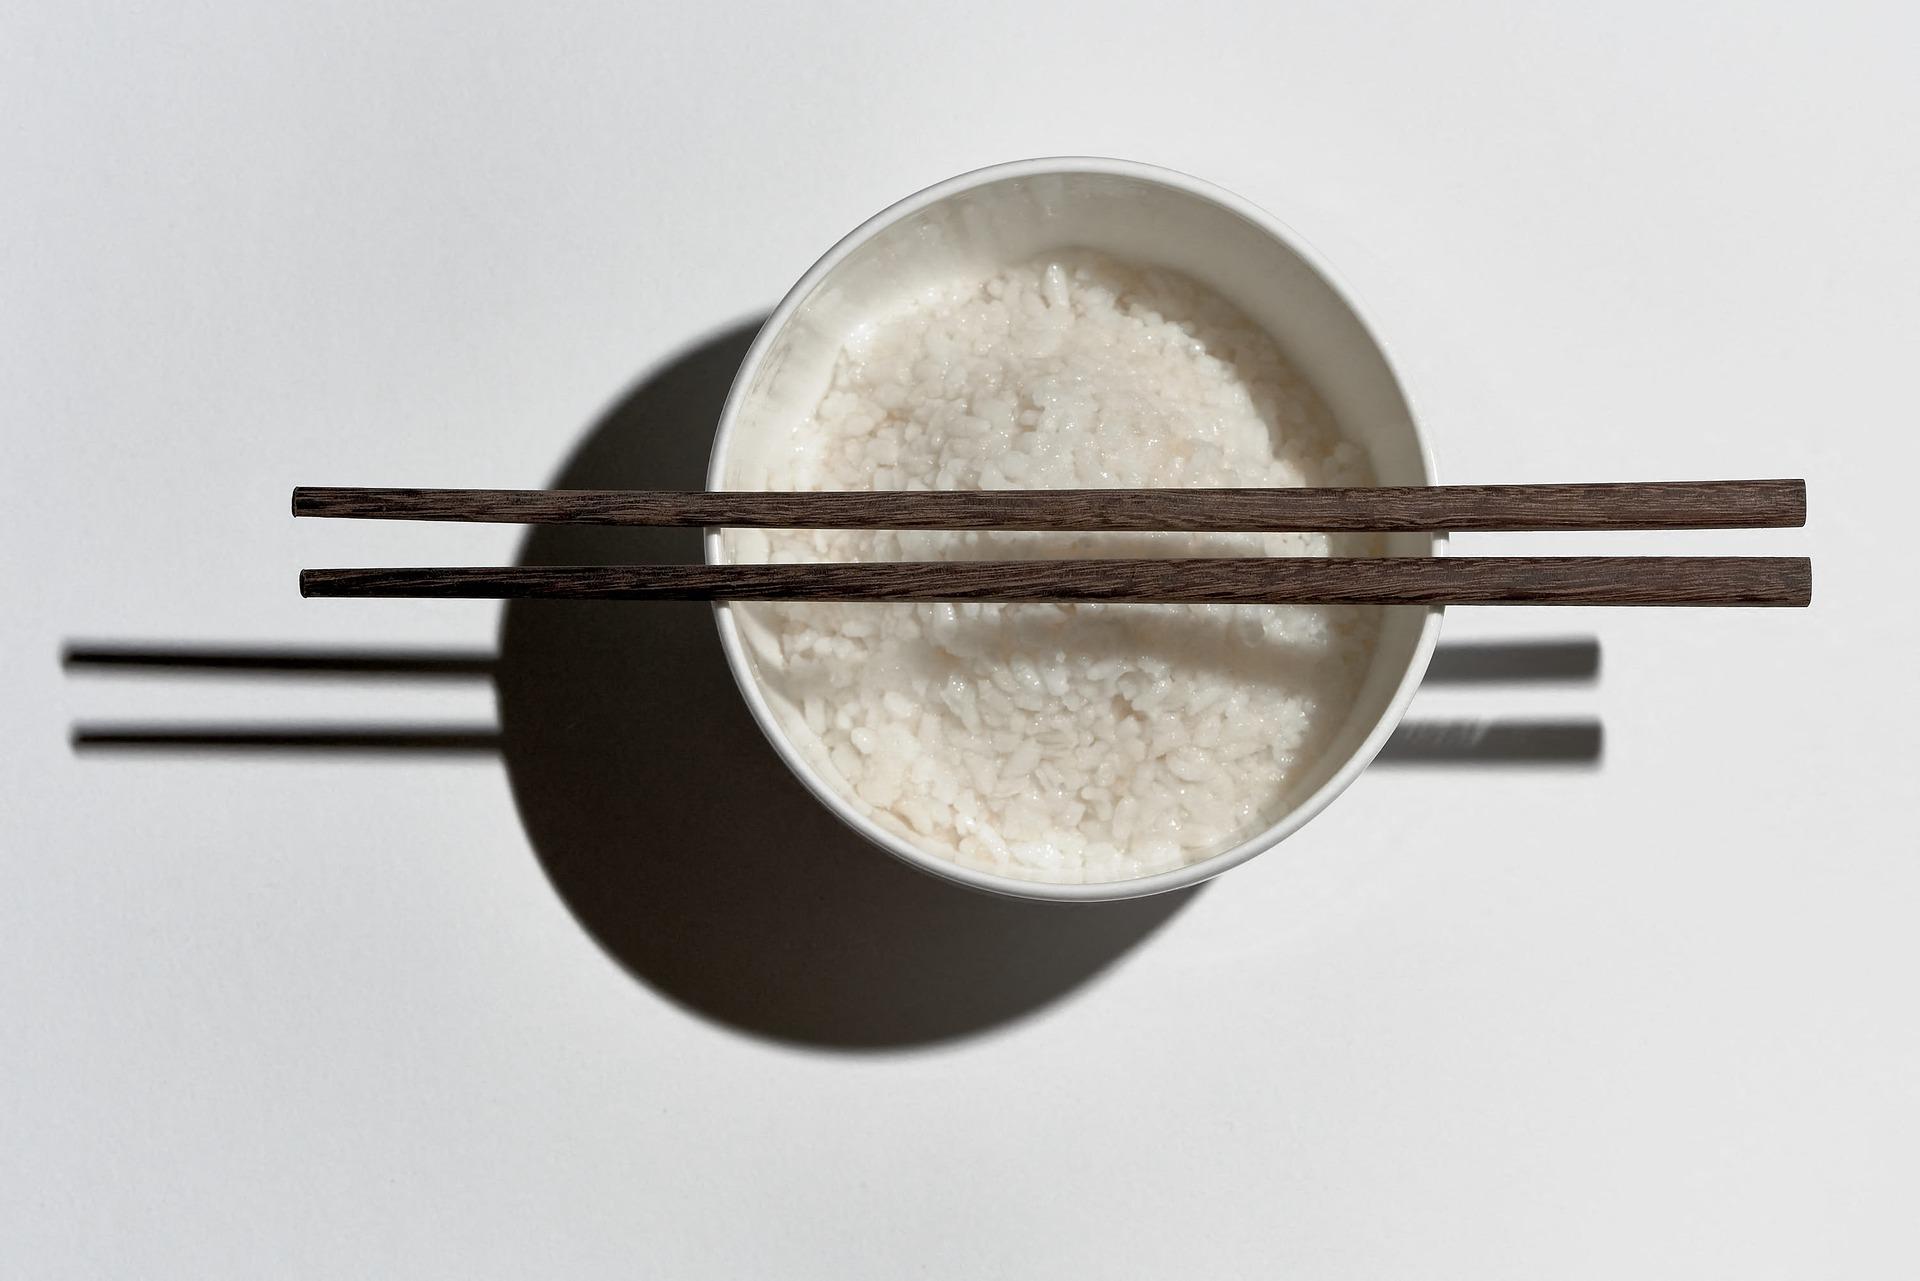 riz superstition